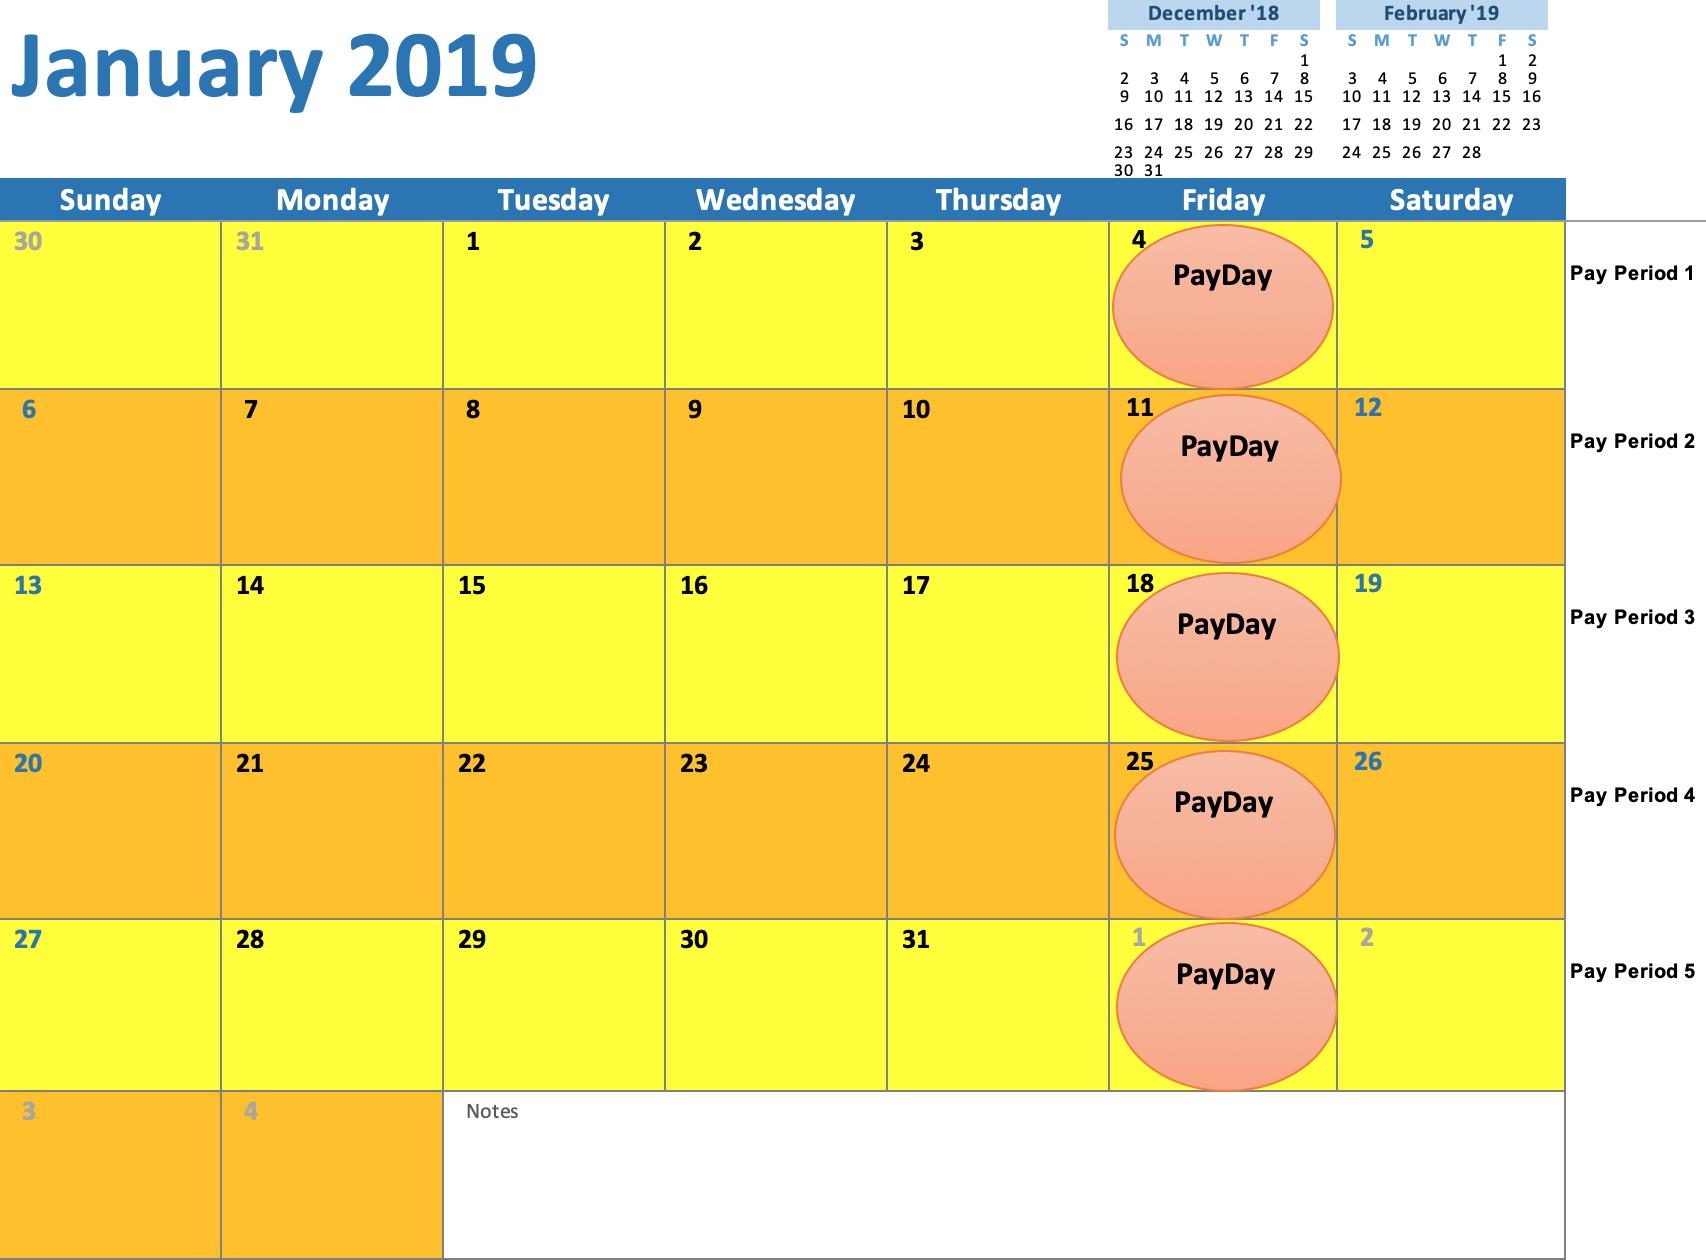 January 2019 Weekly Calendar